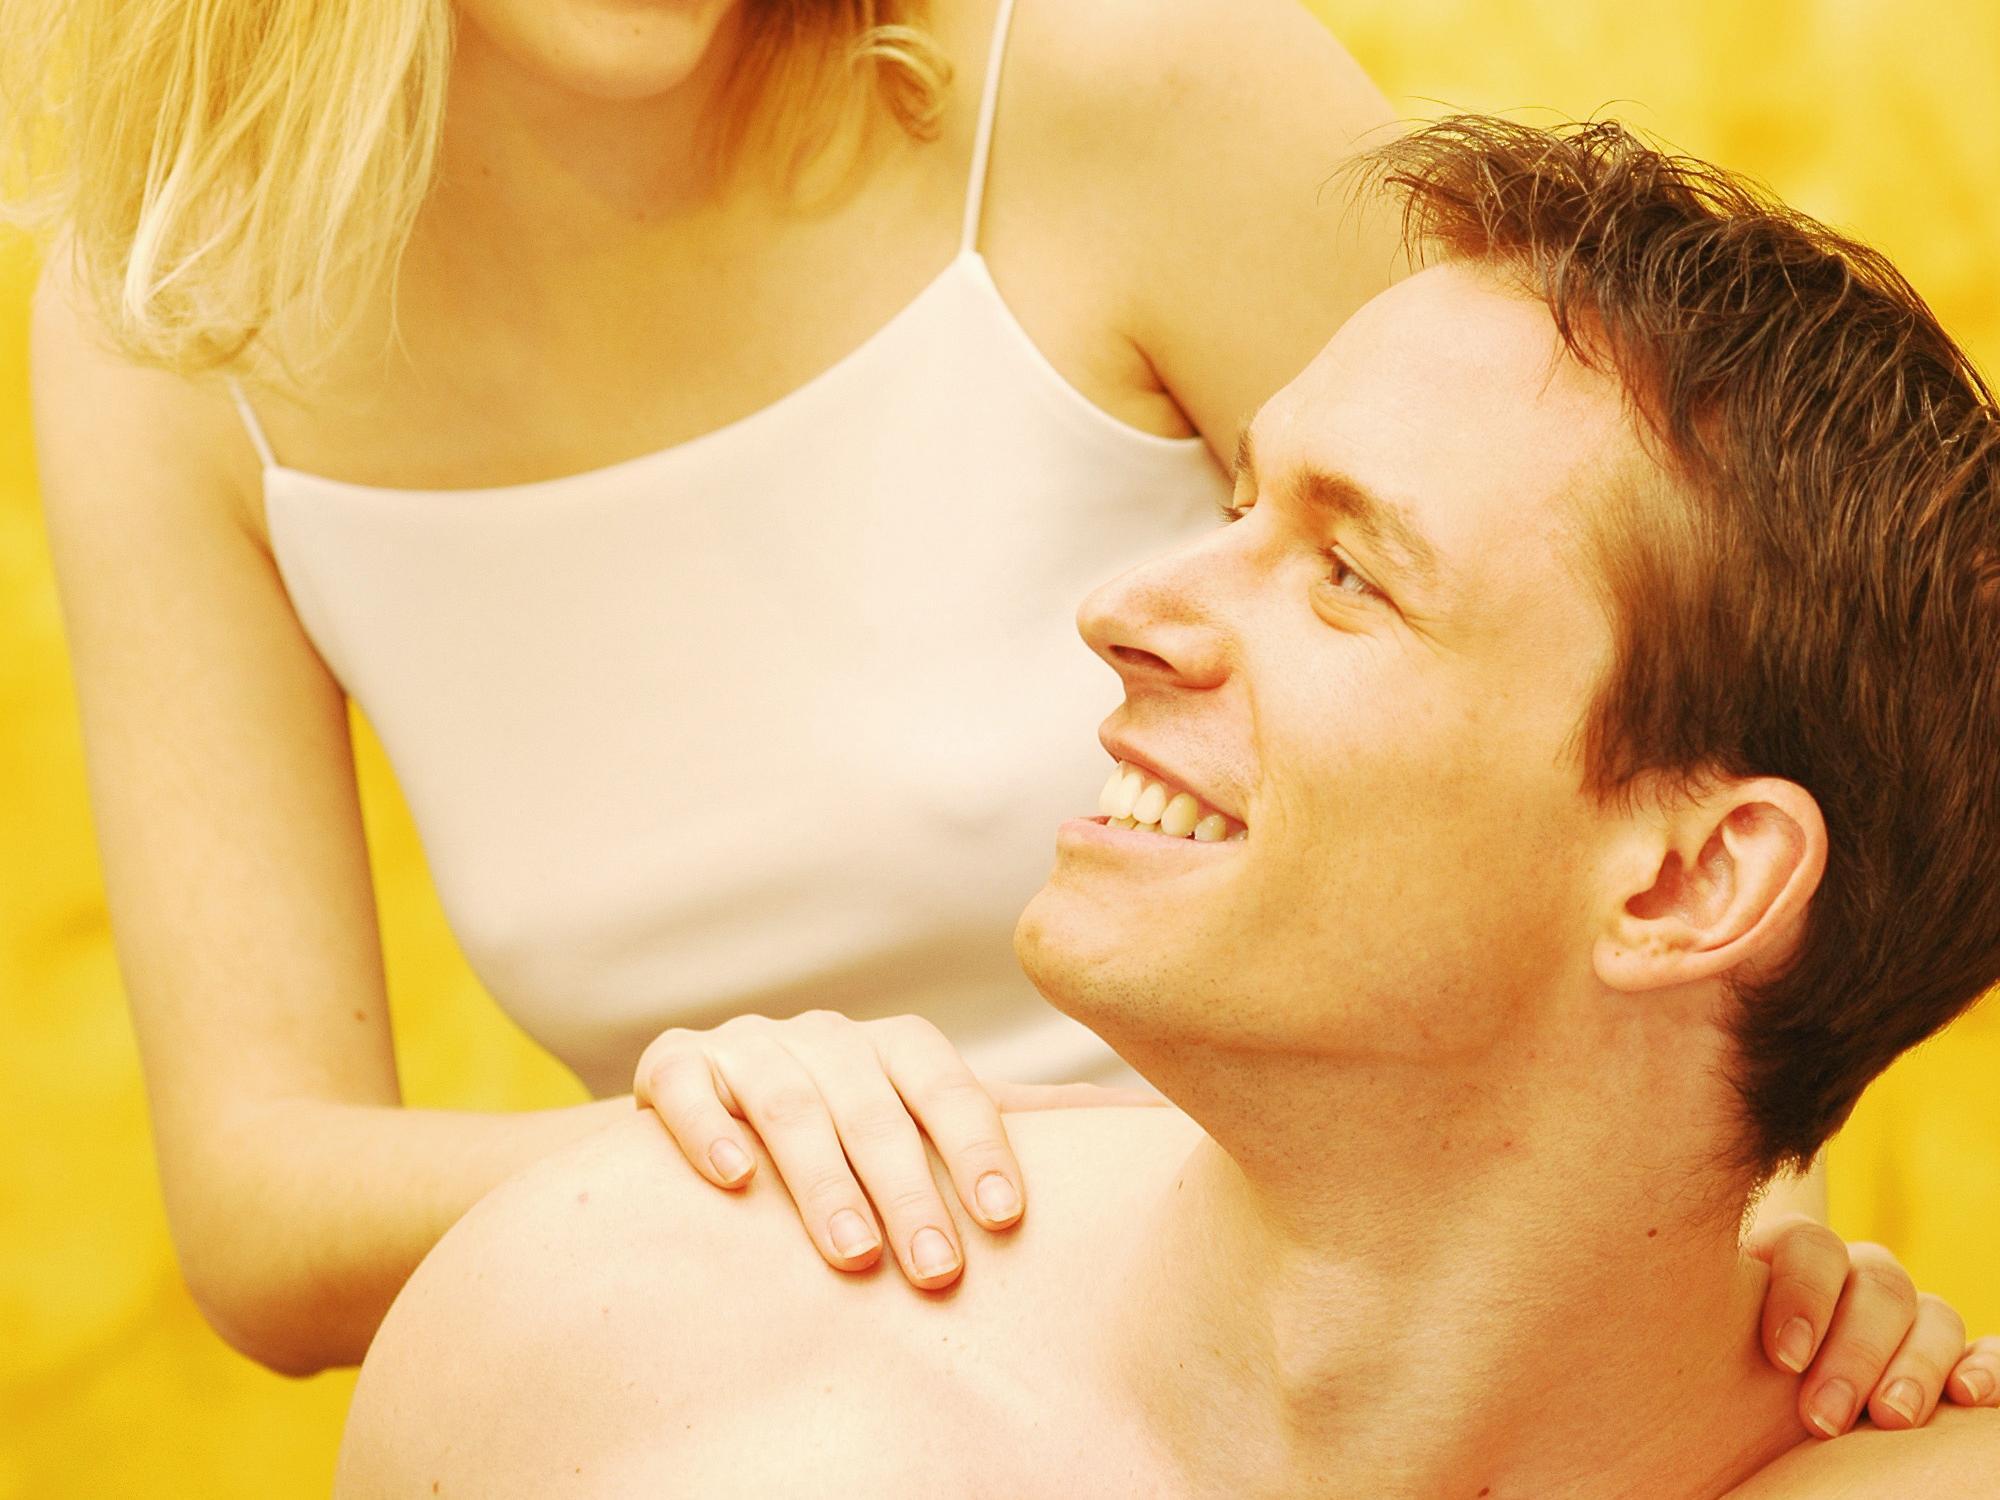 Useimmat erityiset dating sites